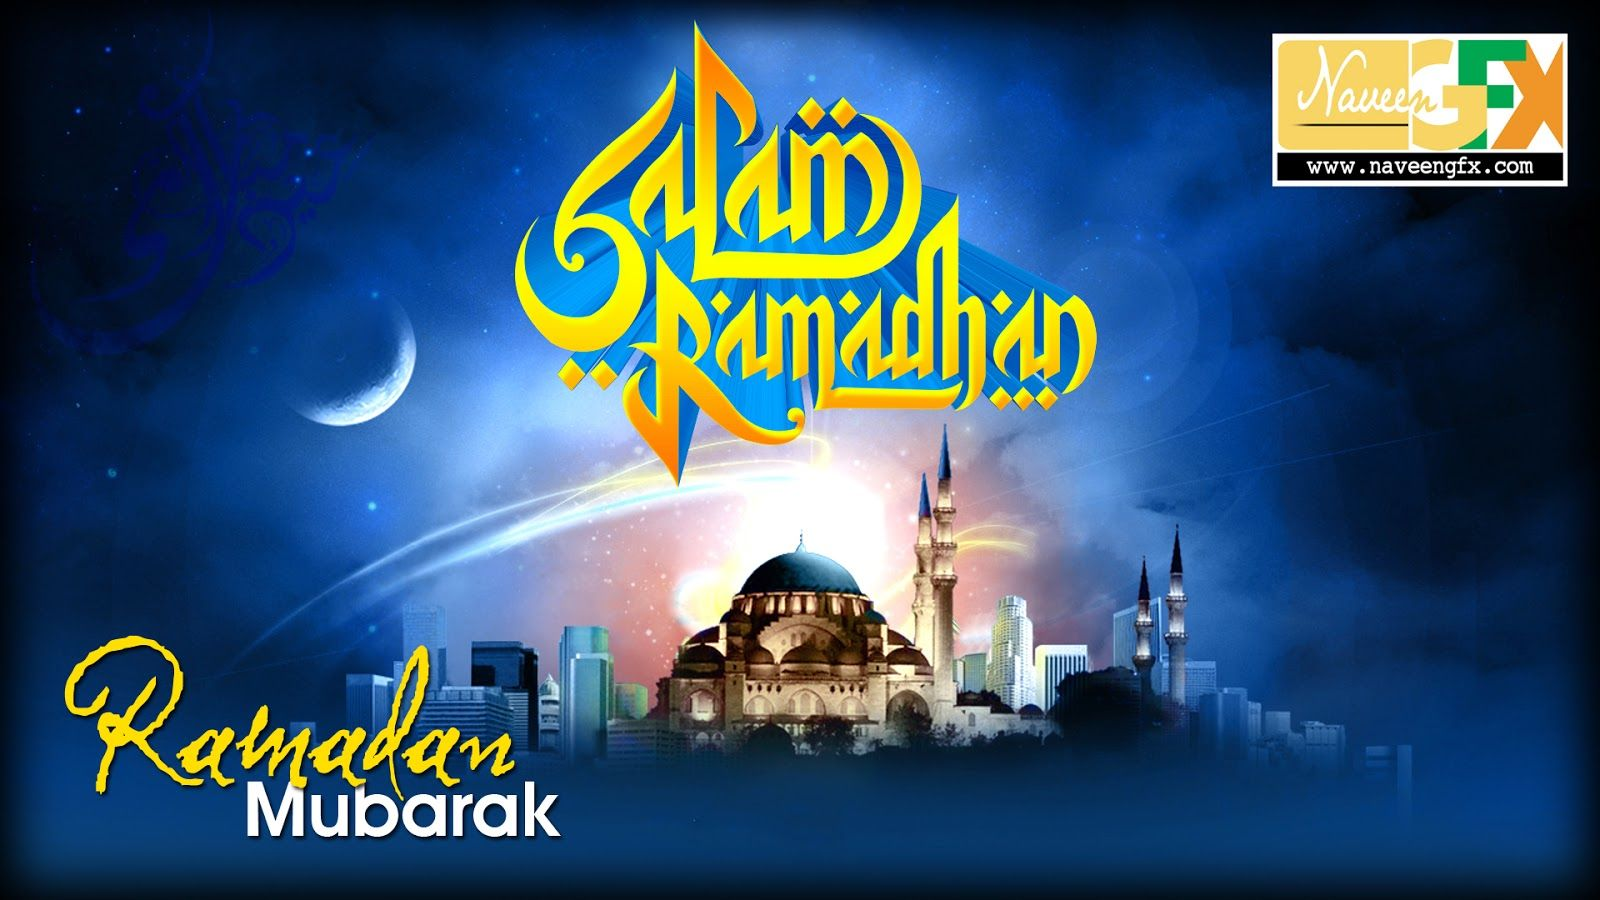 Ramadan chand mubarak images islam pinterest ramadan ramadan chand mubarak images islam pinterest ramadan islamic and islam kristyandbryce Choice Image